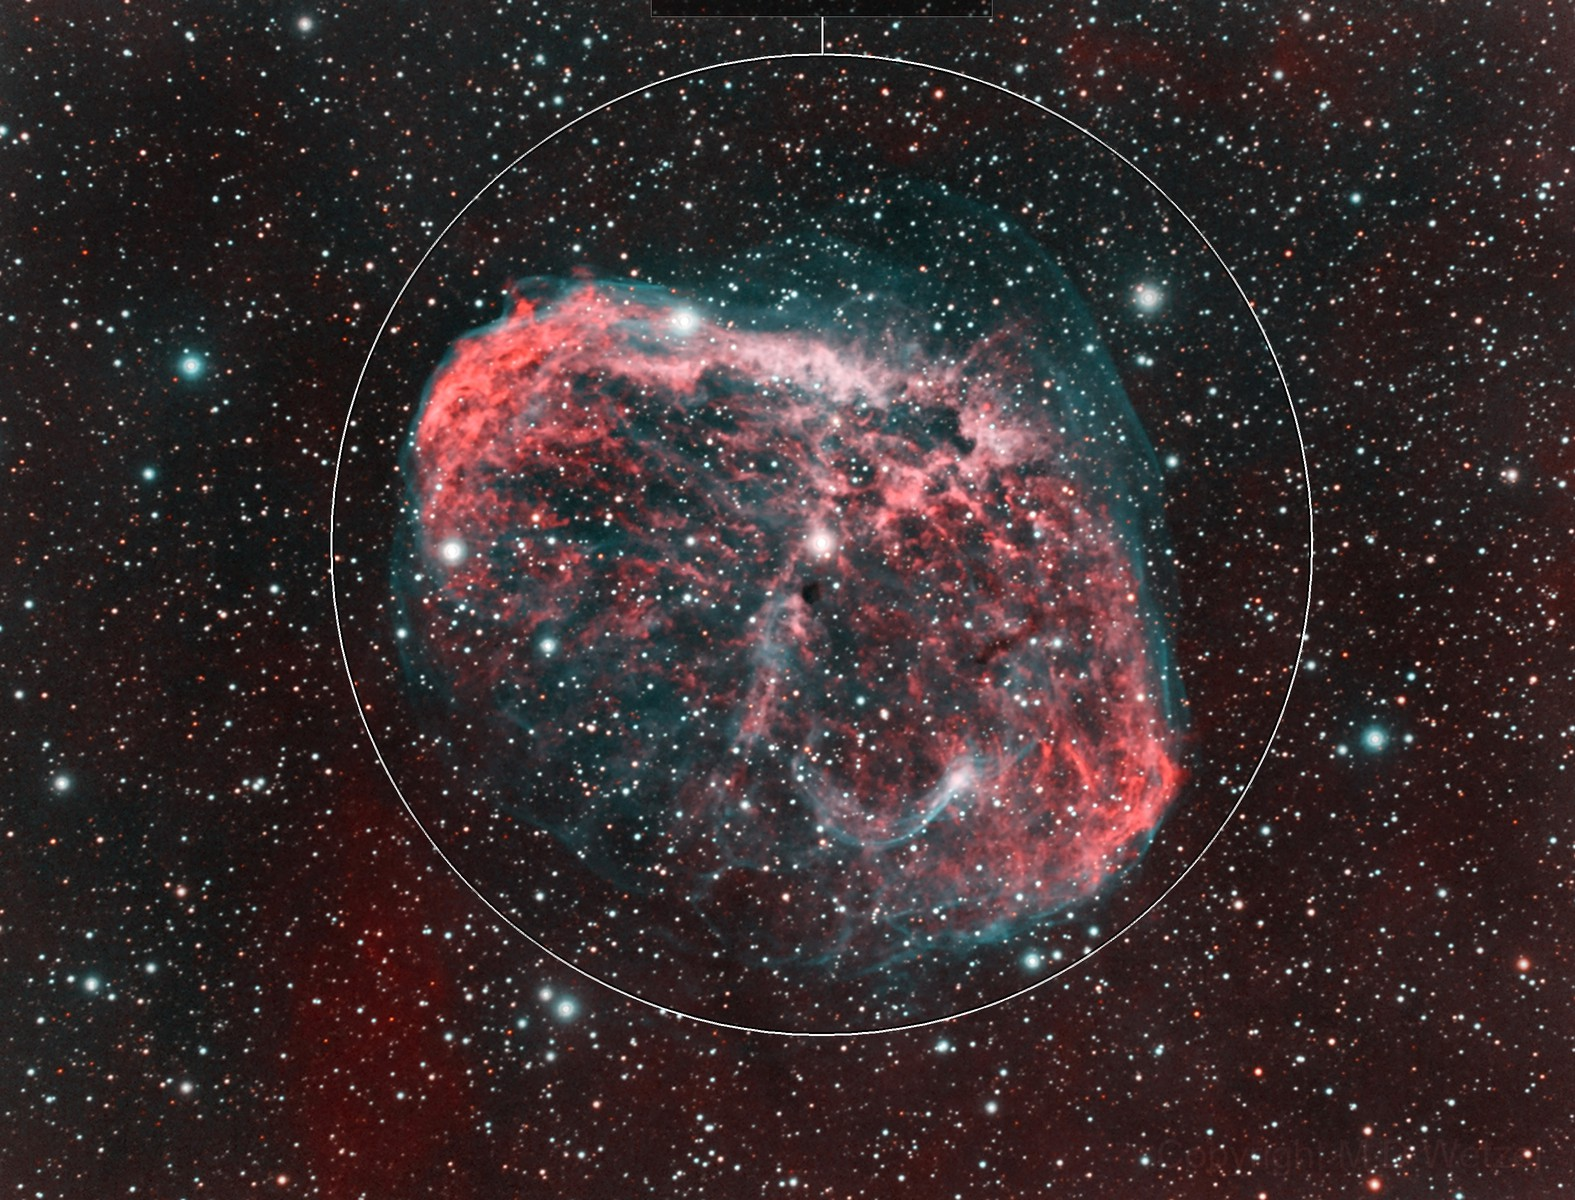 NGC 6888, The Crescent Nebula